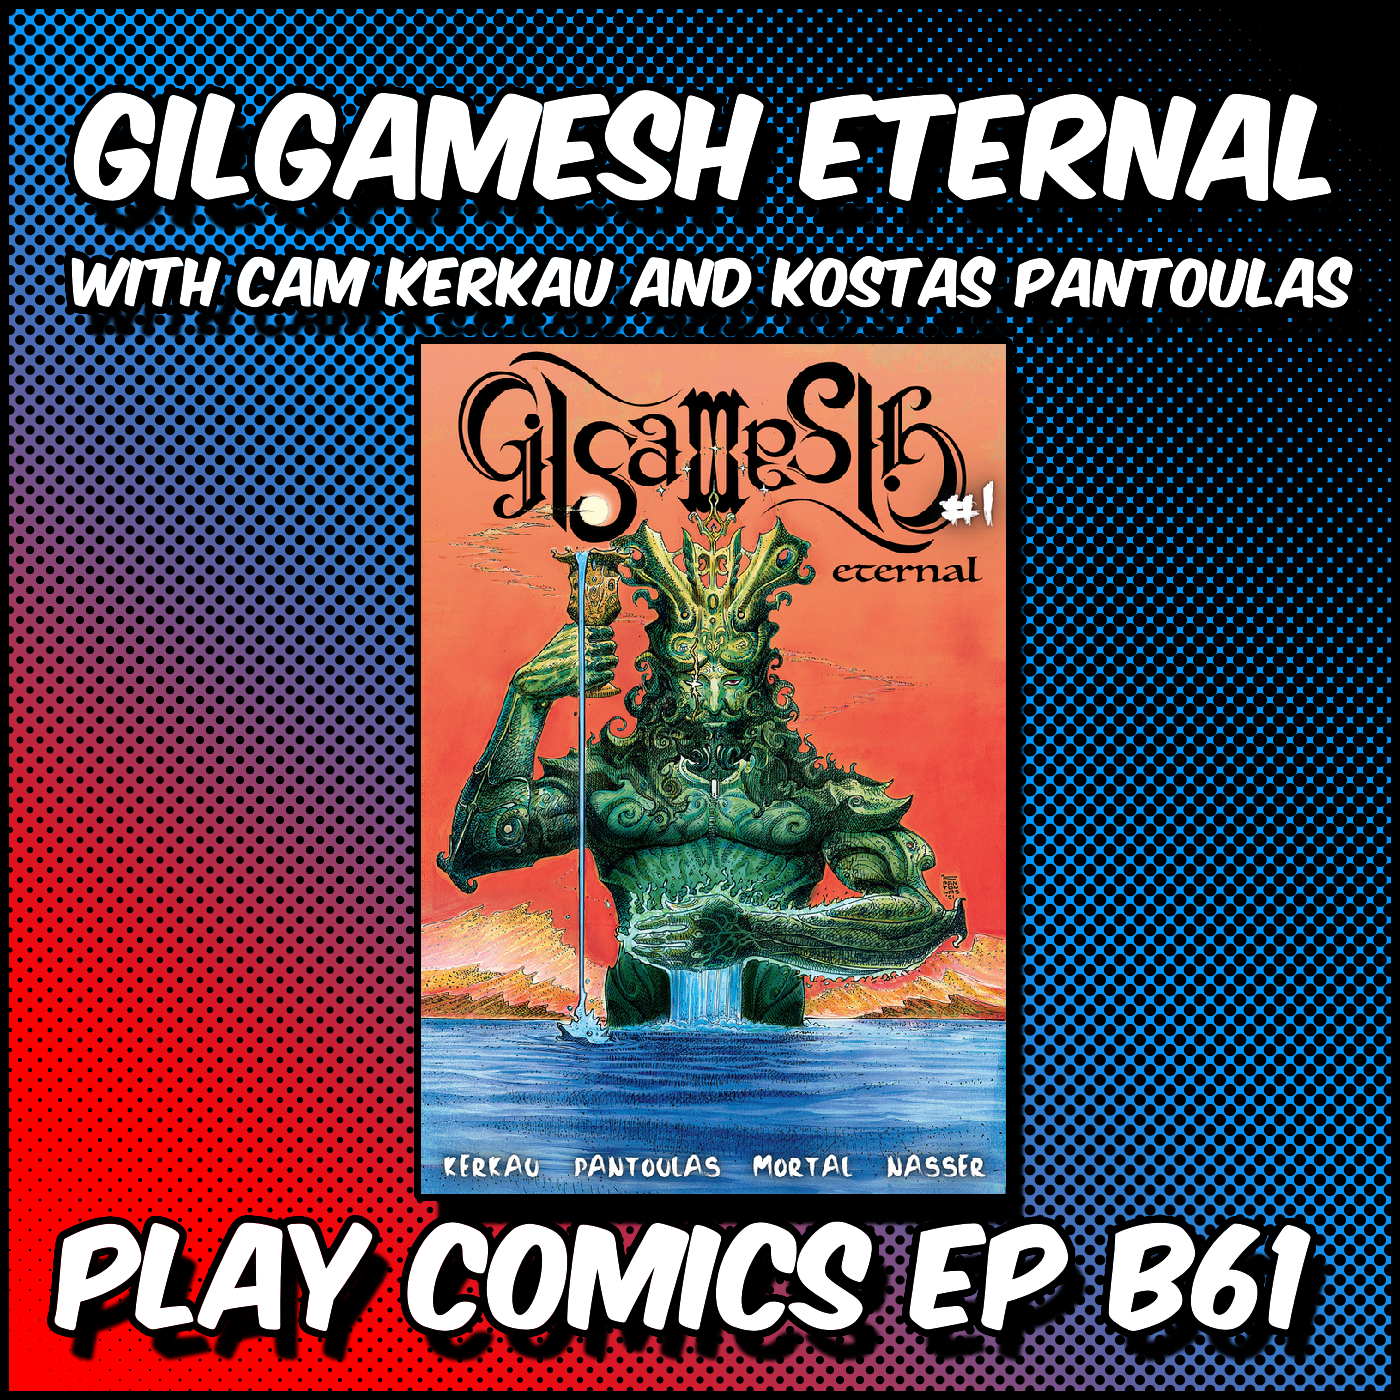 Gilgamesh Eternal with Cam Kerkau and Kostas Pantoulas